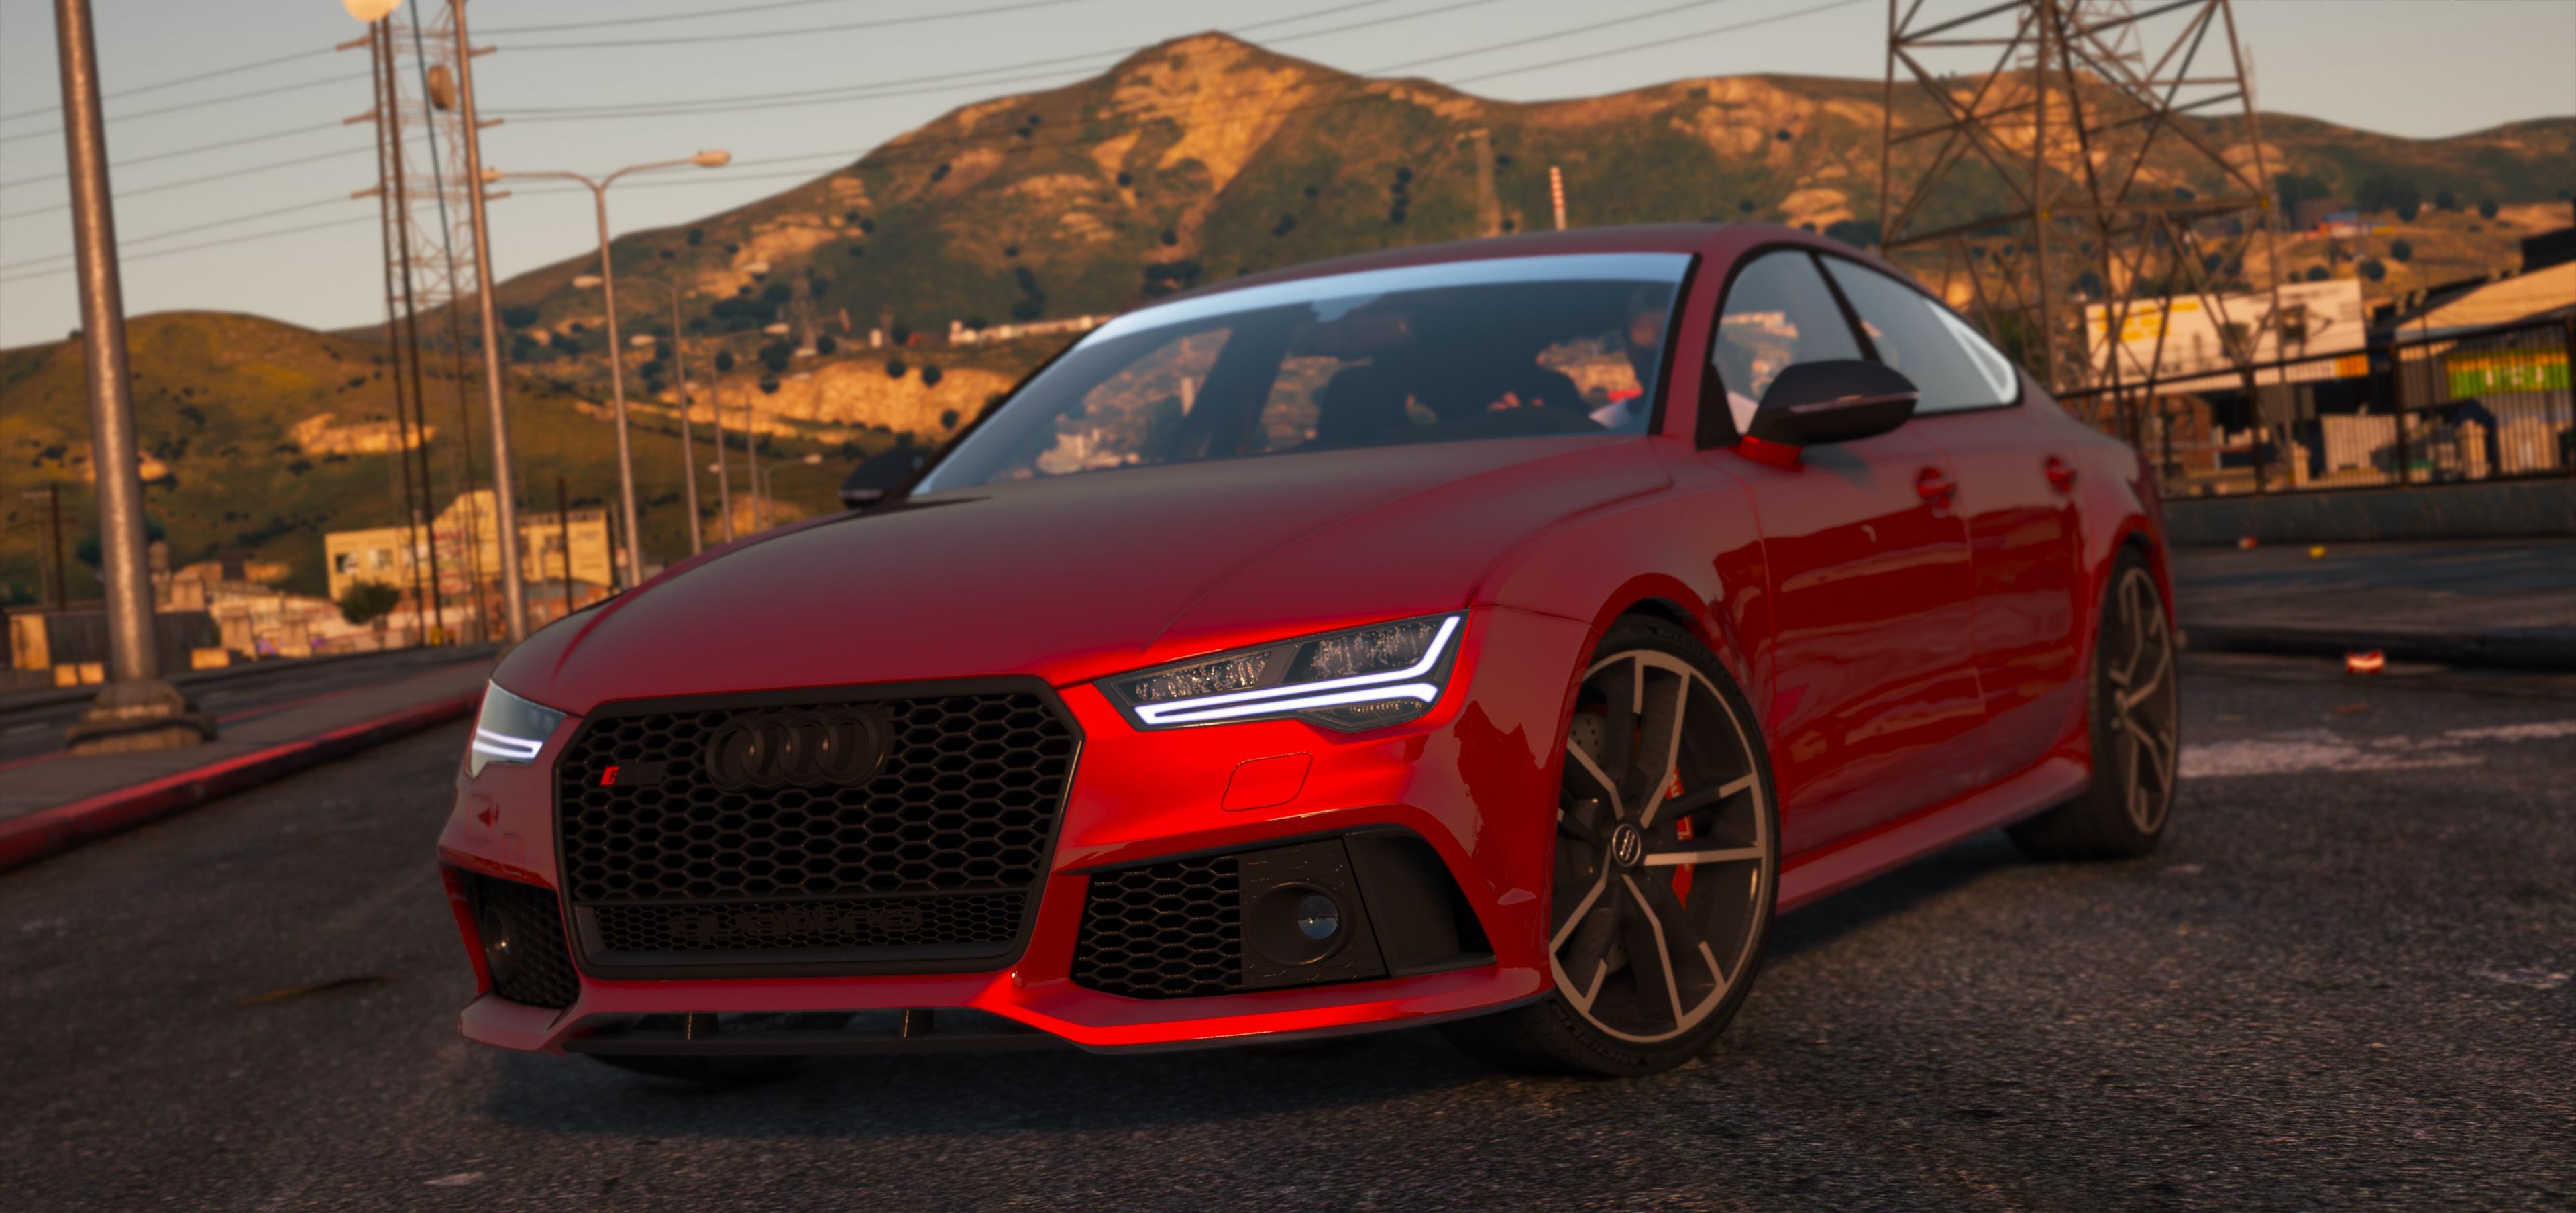 2016 Audi RS7 GTA5 Mods